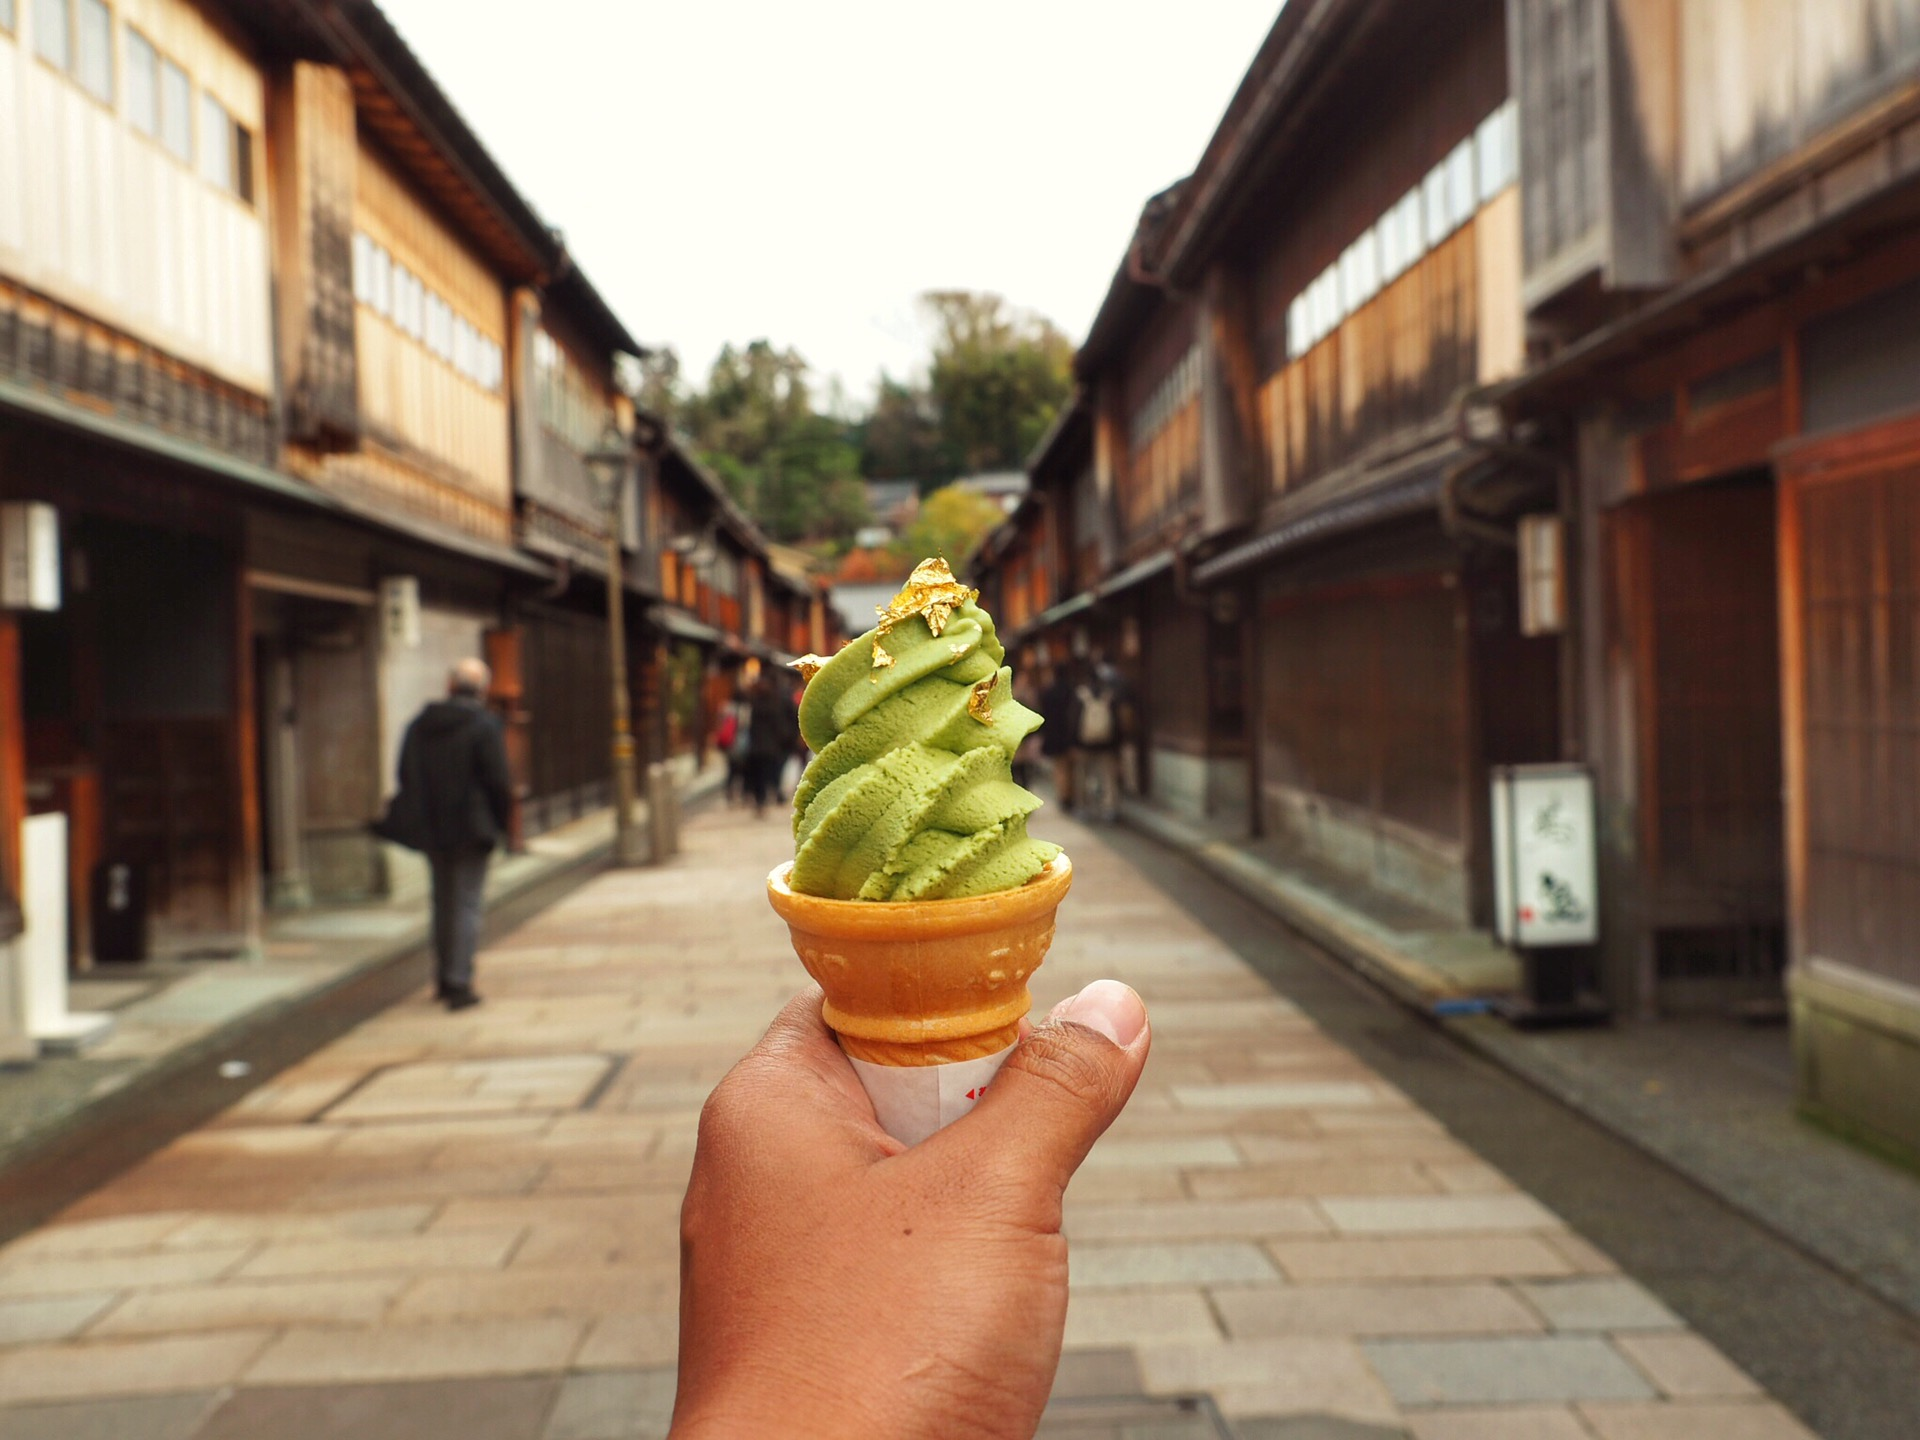 Nikmatnya Ice Cream di Jepang – My World in My Words